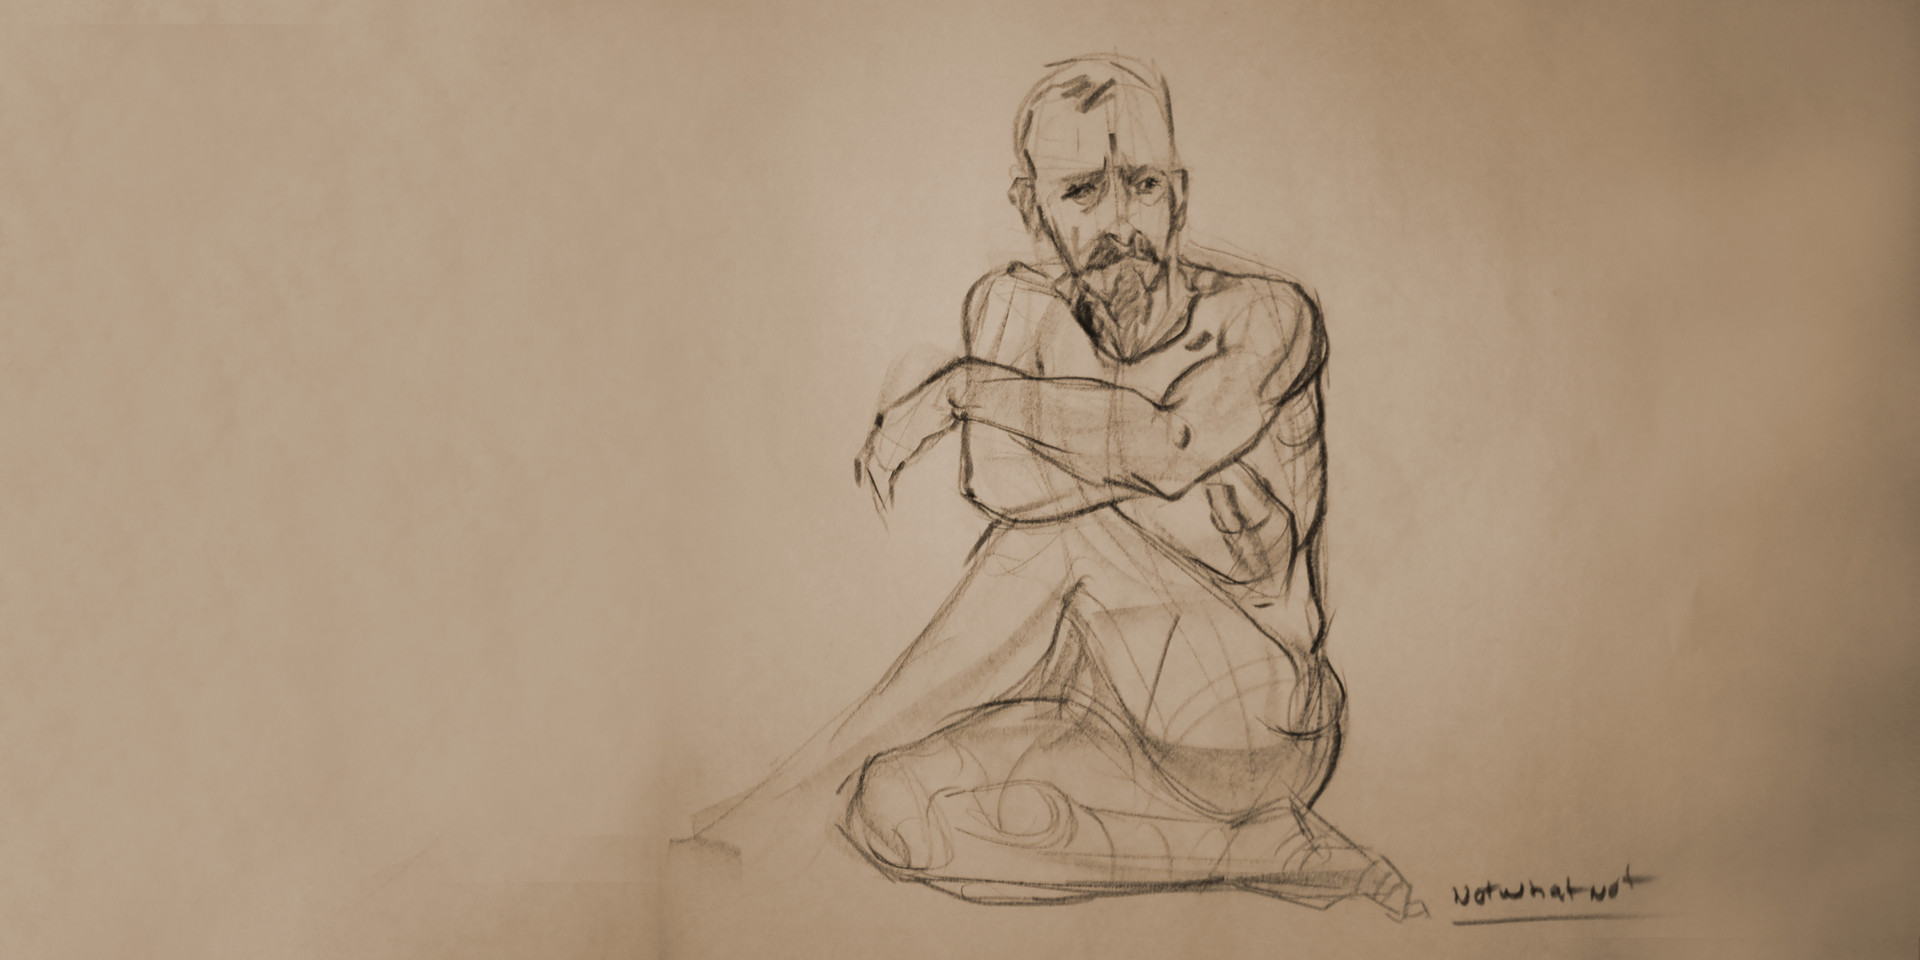 Life drawing, 5 min, 2015